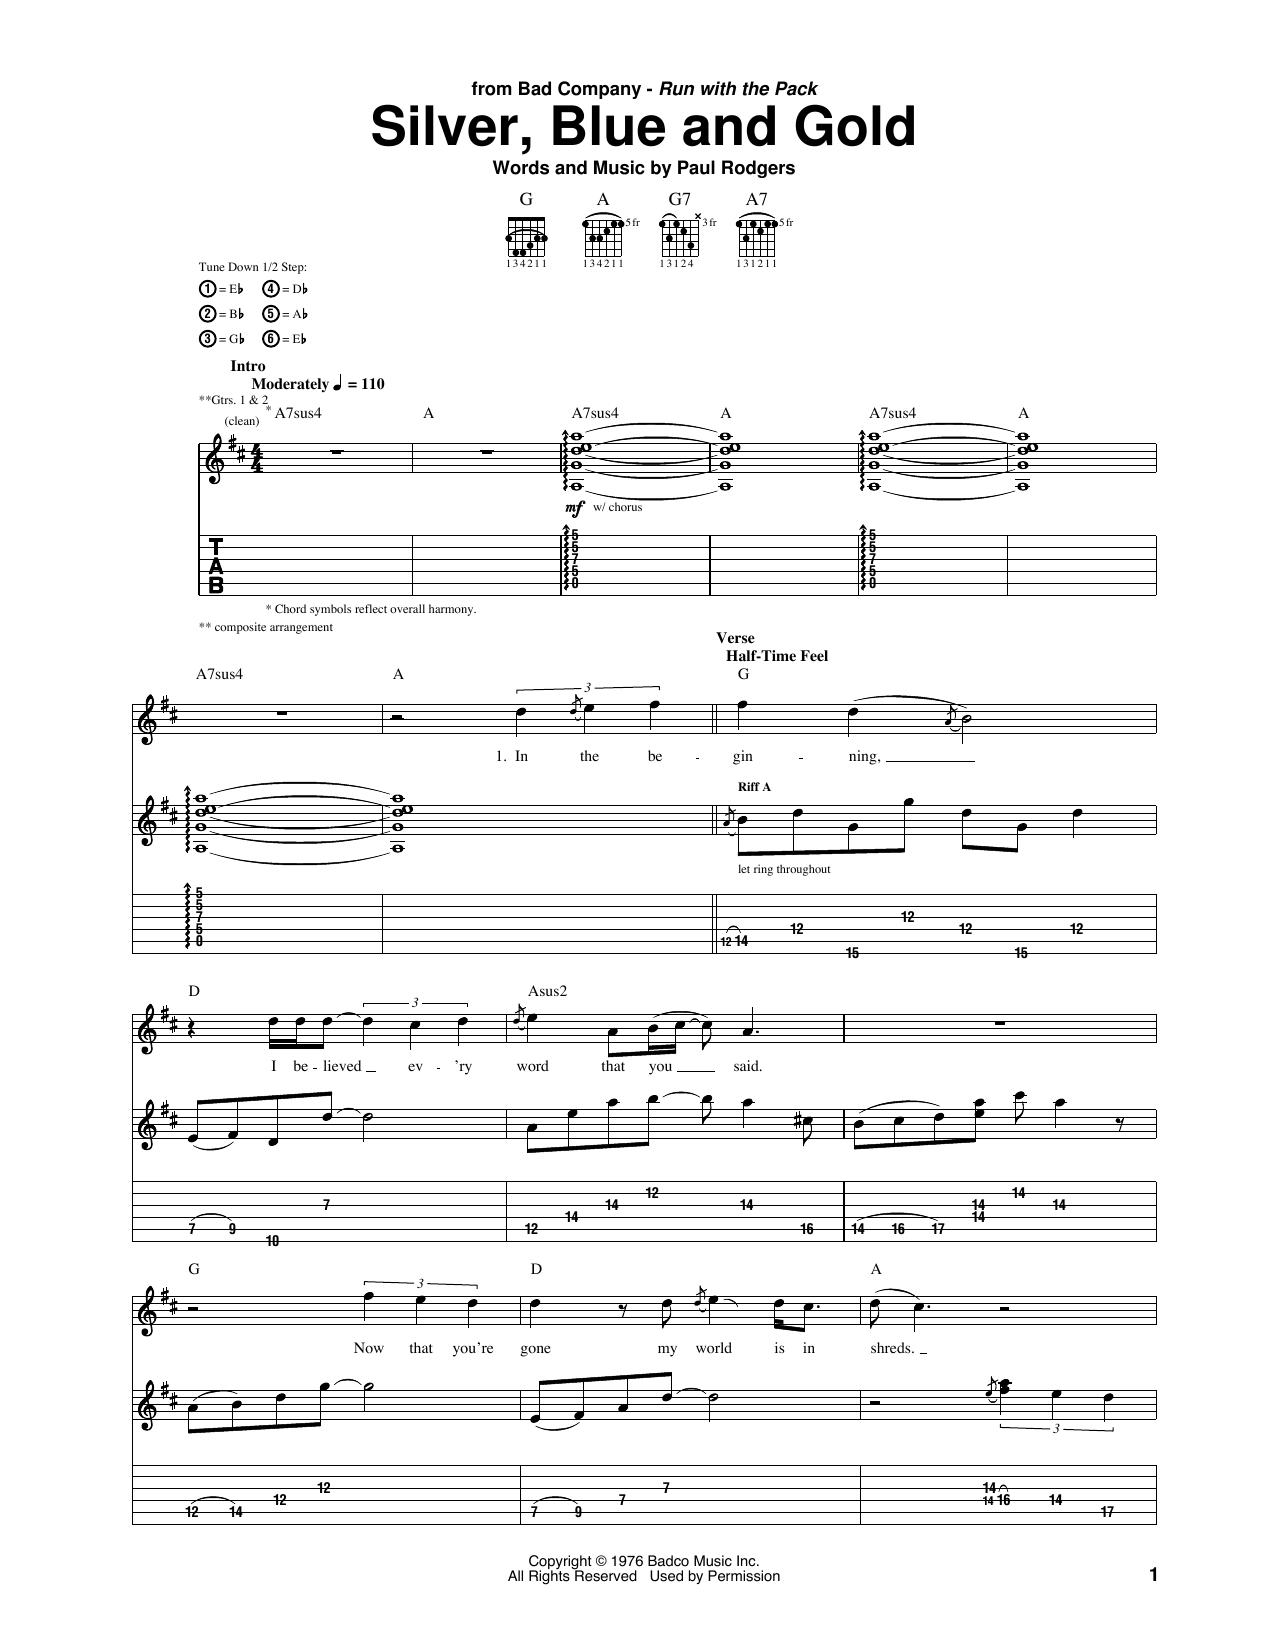 Bad company guitar chords